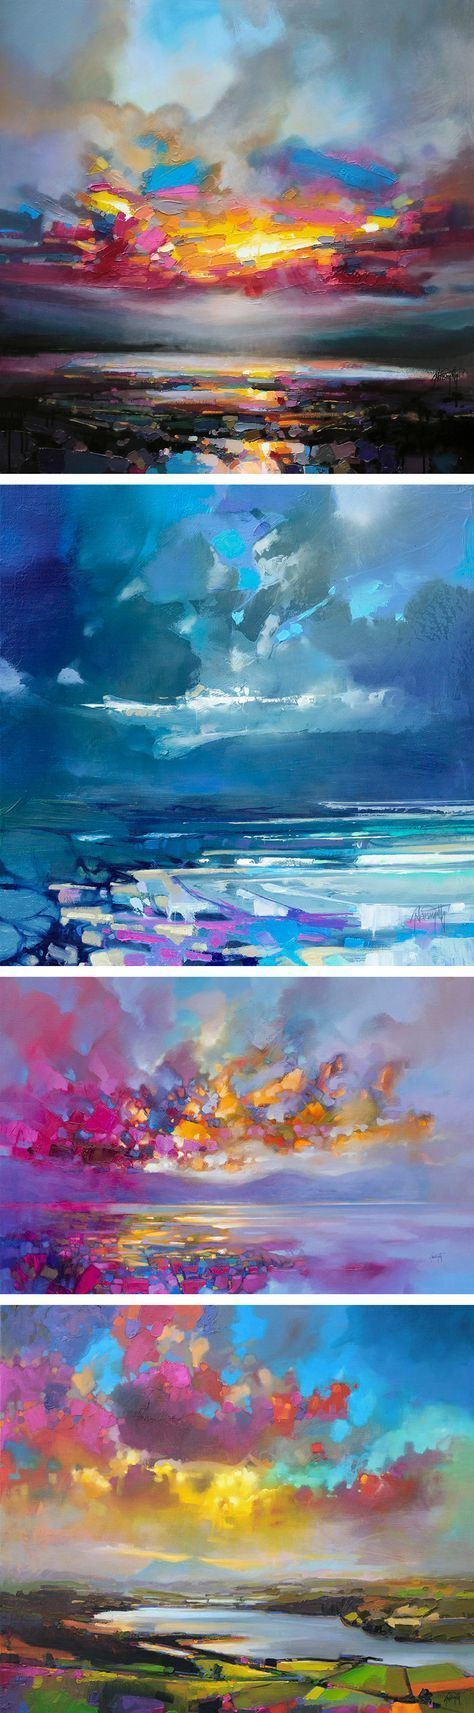 Vibrant Oil Paintings of Scottish Landscapes by Scott Naismith #OilPaintingInspiration #OilPaintingOcean